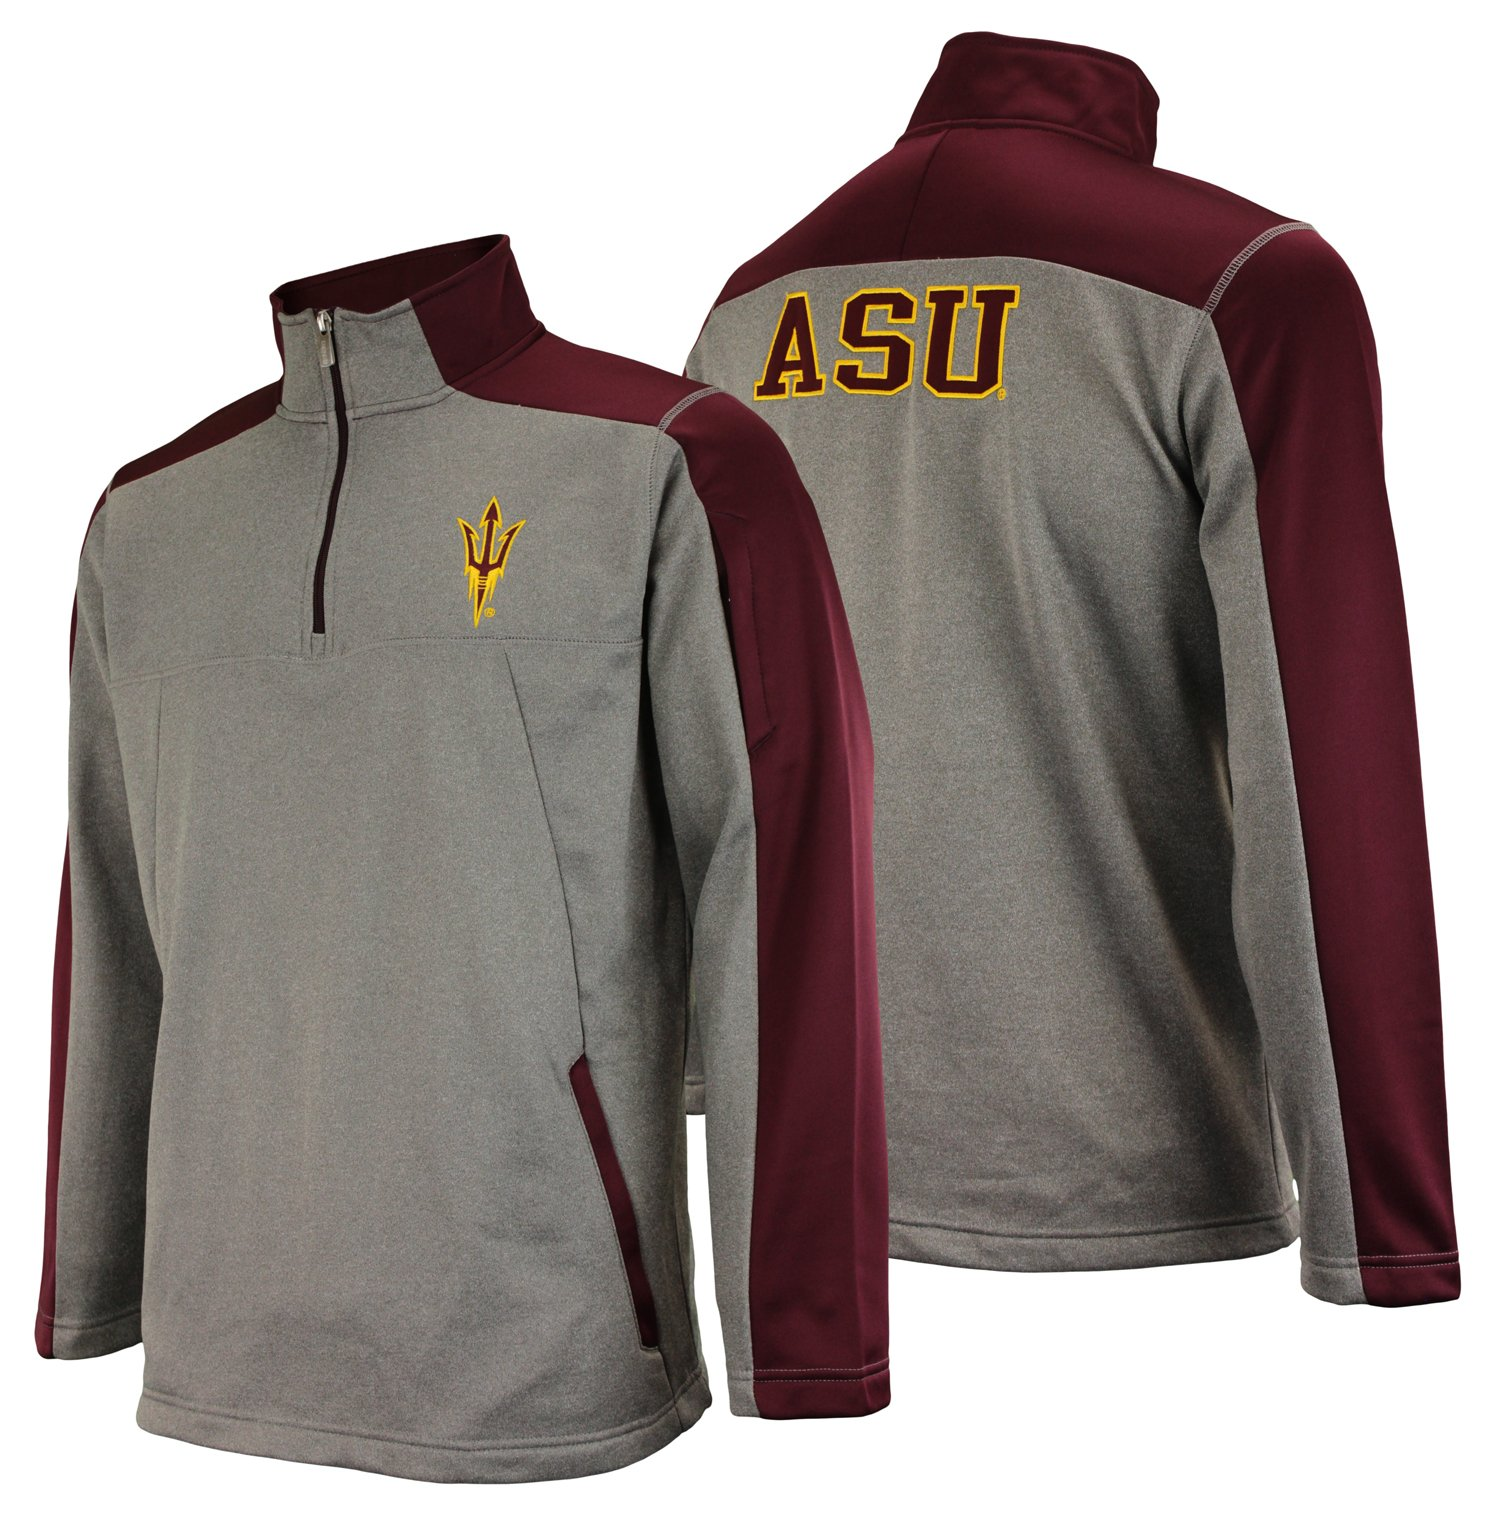 Outerstuff NCAA Men's Arizona State Sun Devils Performance Poly Fleece 1/4 Zip Up